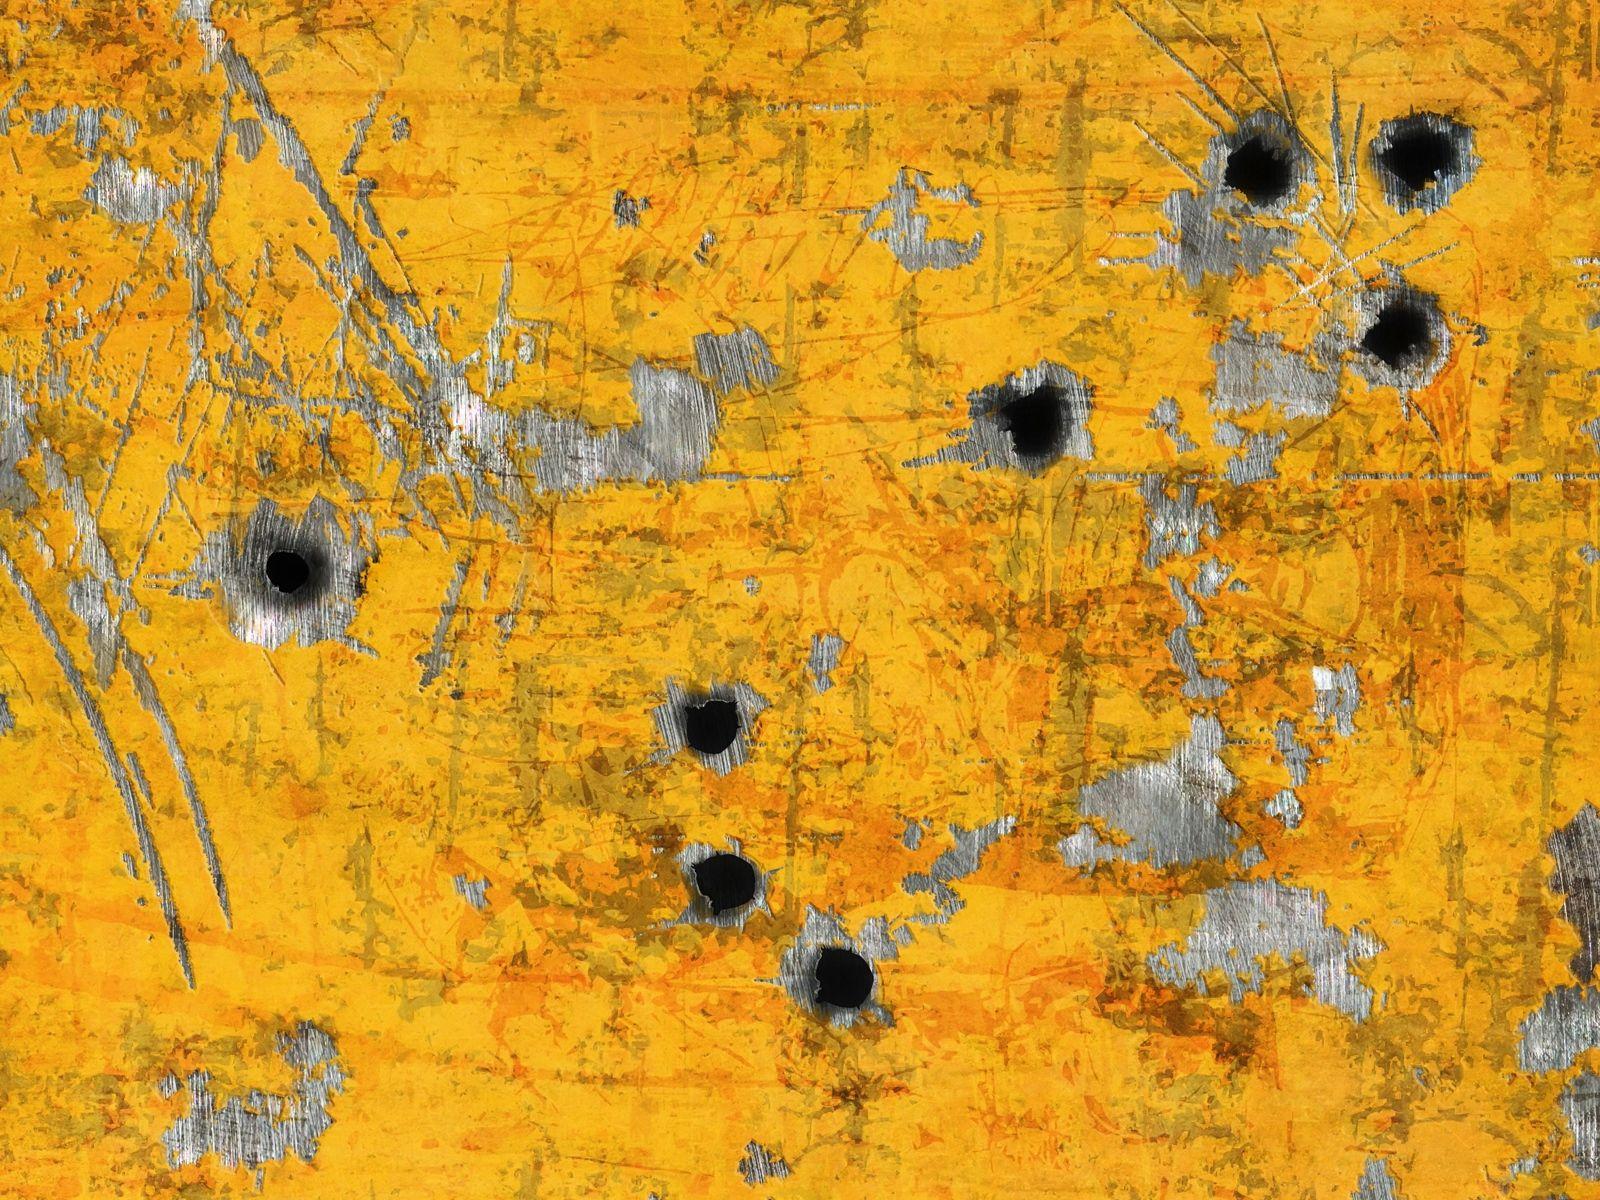 1600x1200 Wallpaper Paint Metal Bullet Holes Stains